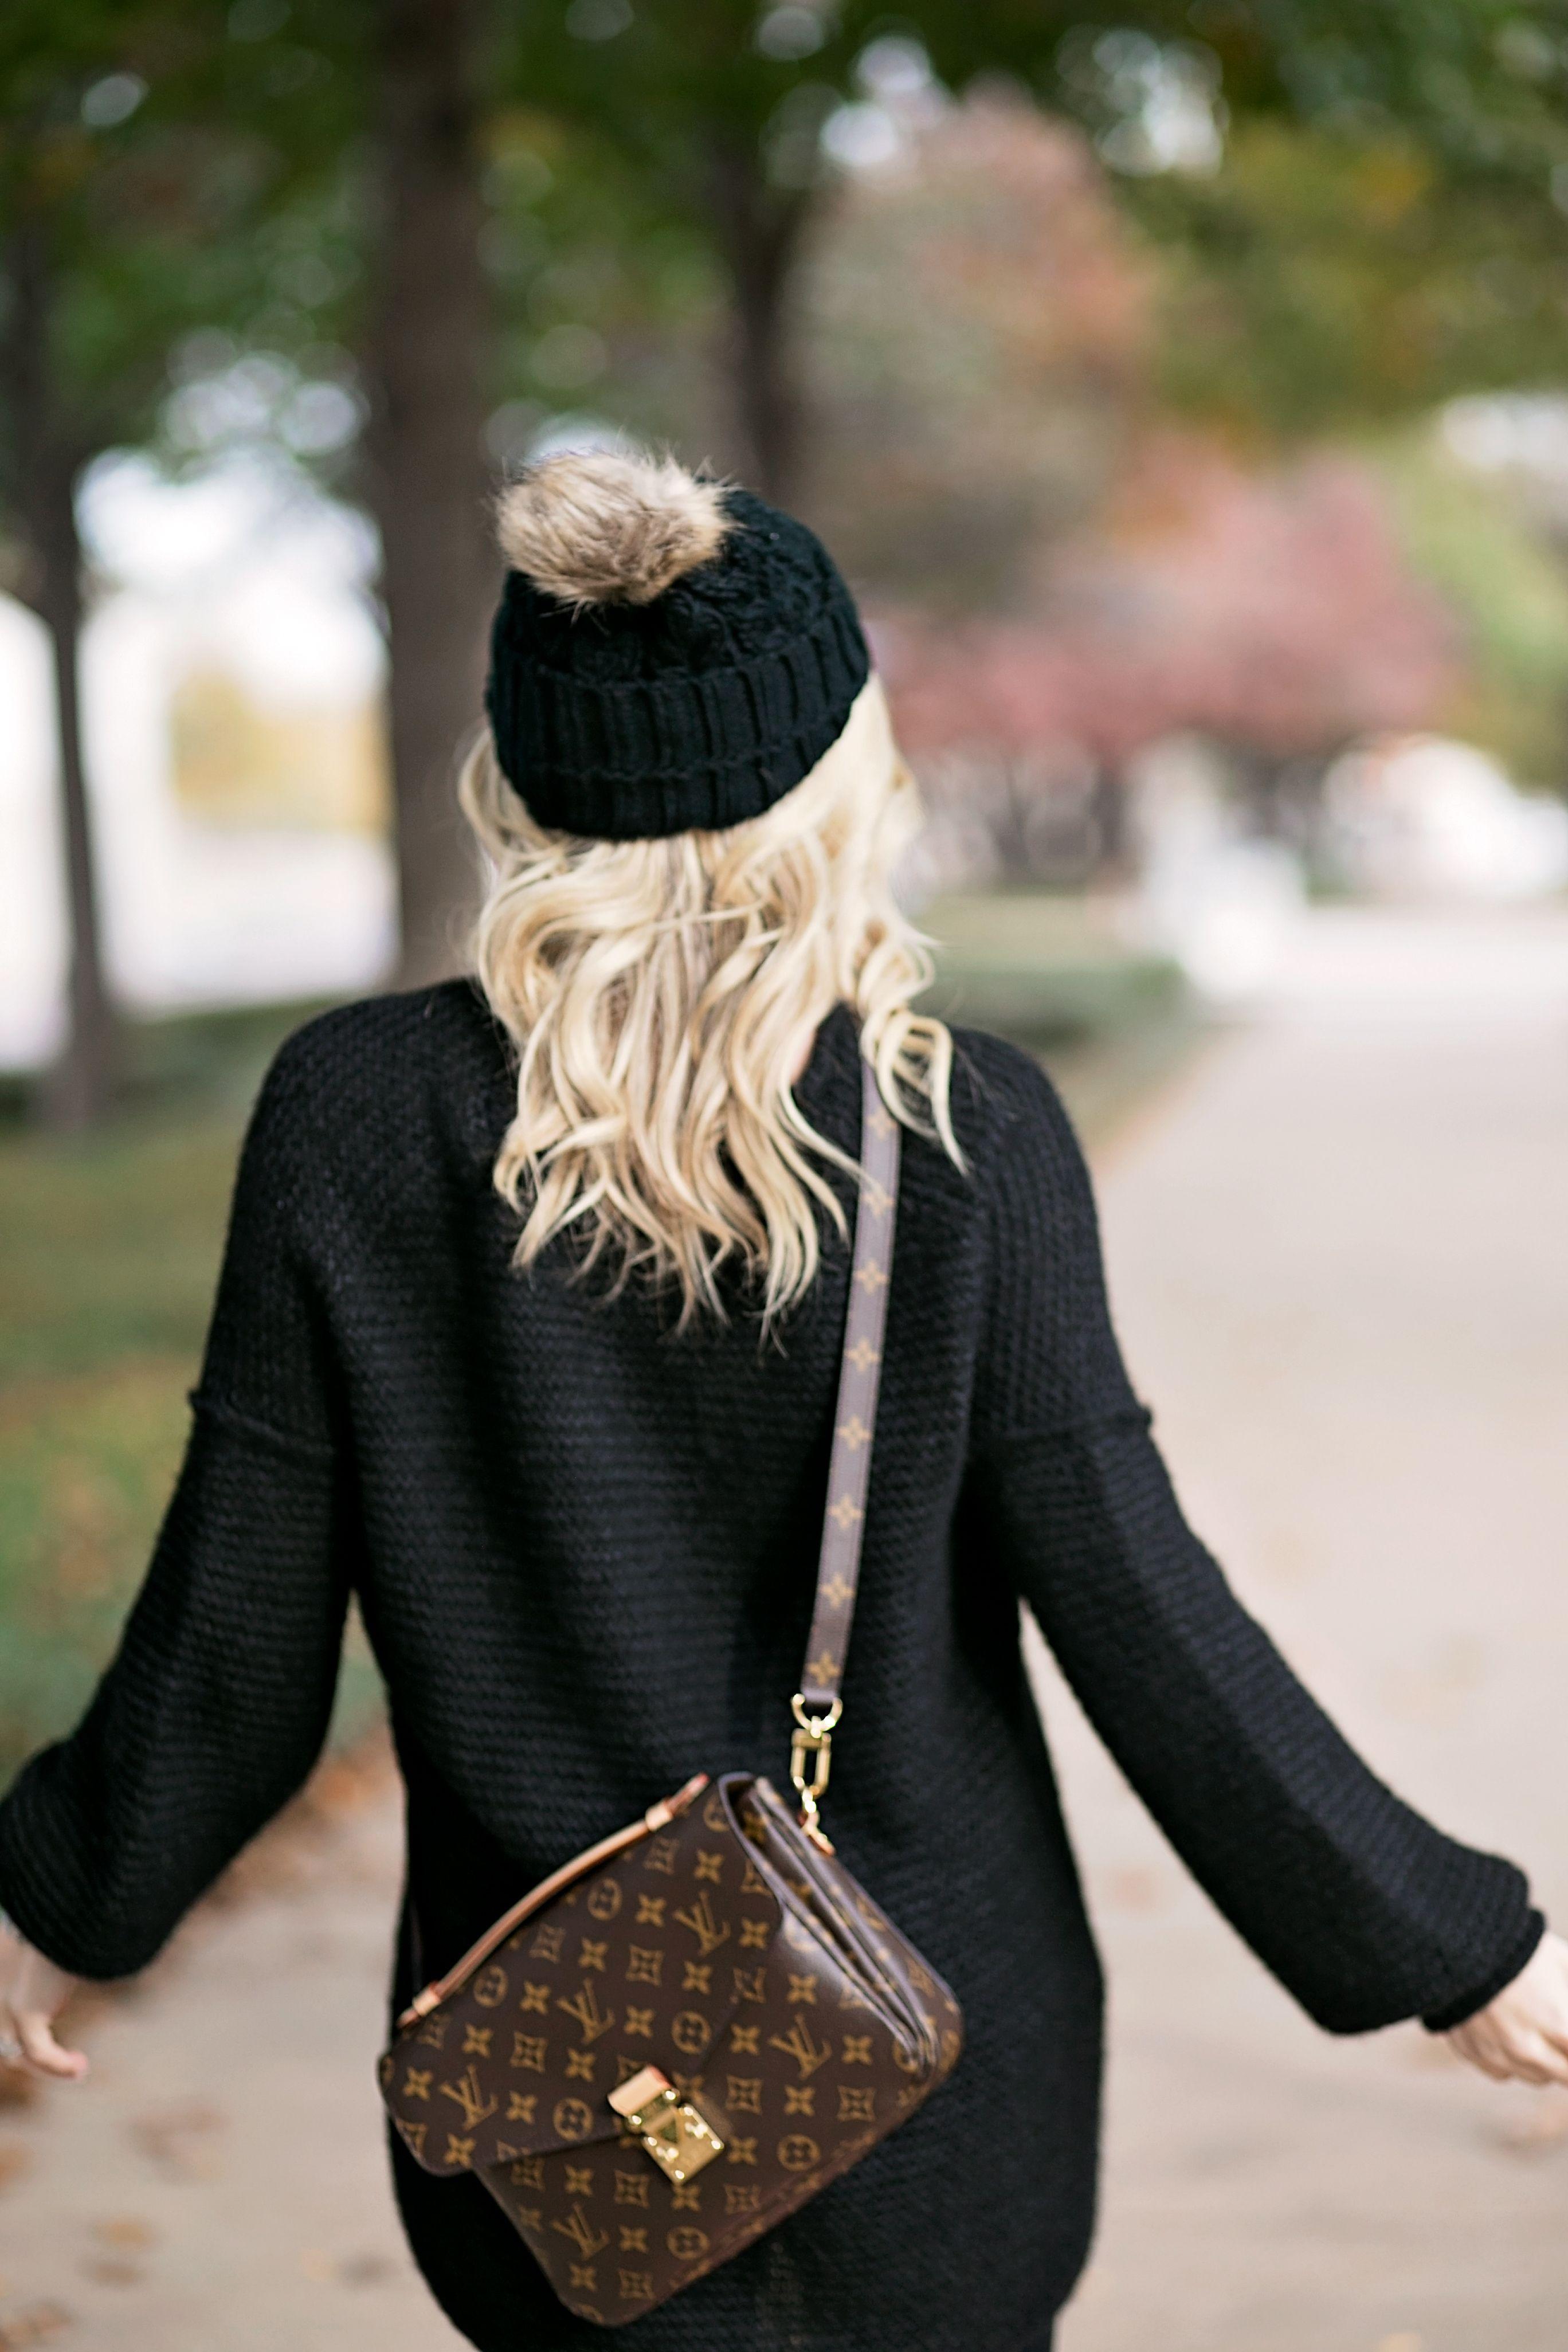 Louis Vuitton Crossbody Louis Vuitton Handbags In 2018 Pinterest